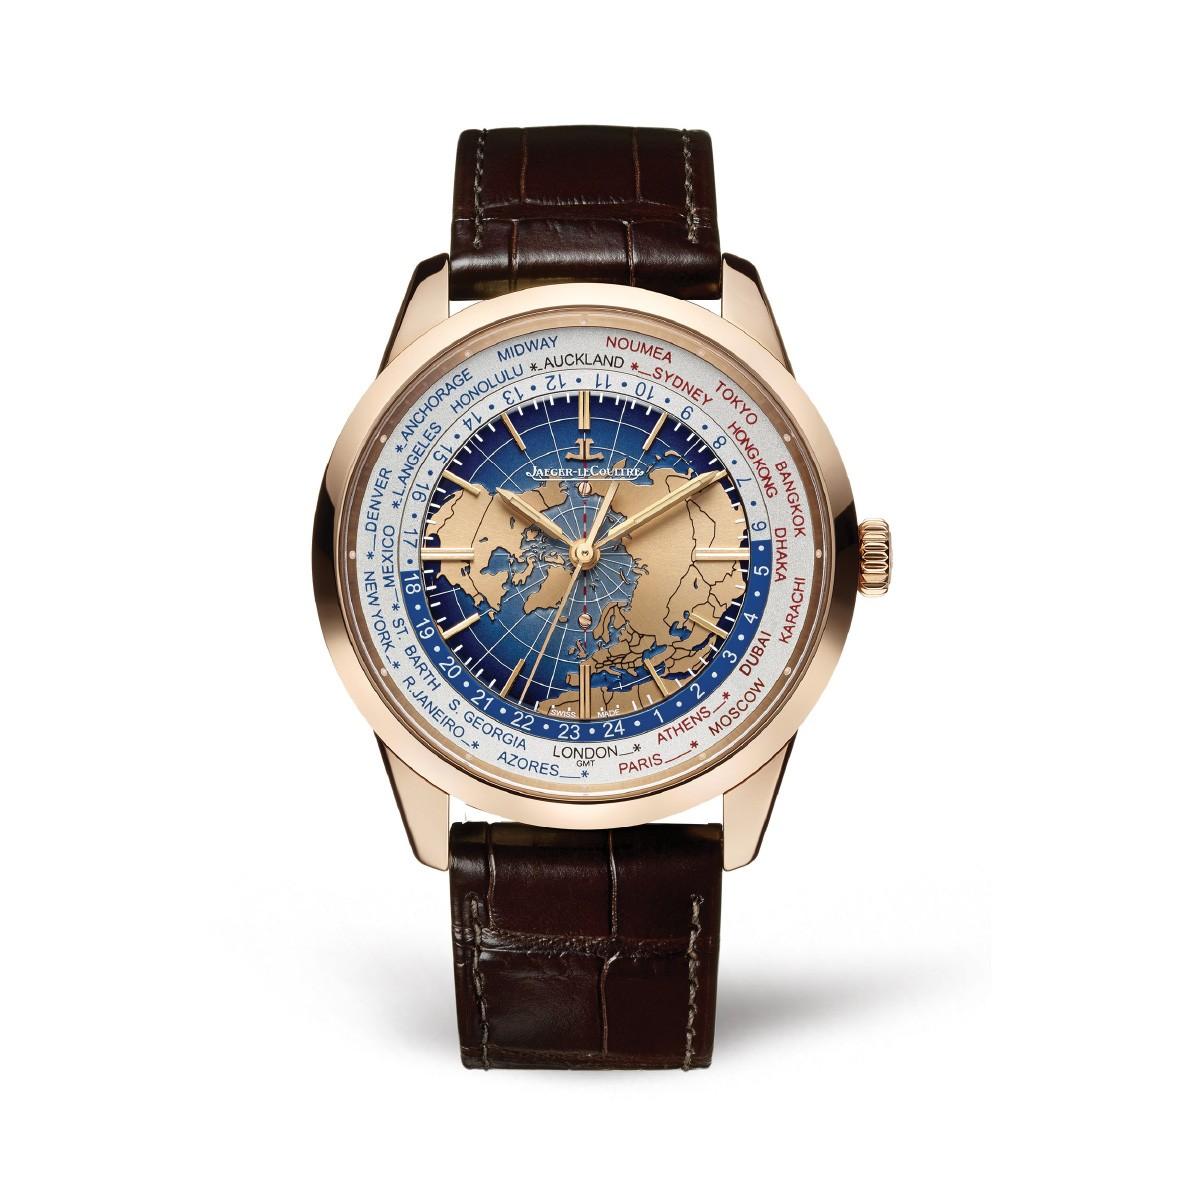 Produkt JLC Master Geophysic Universal Time ref Preis